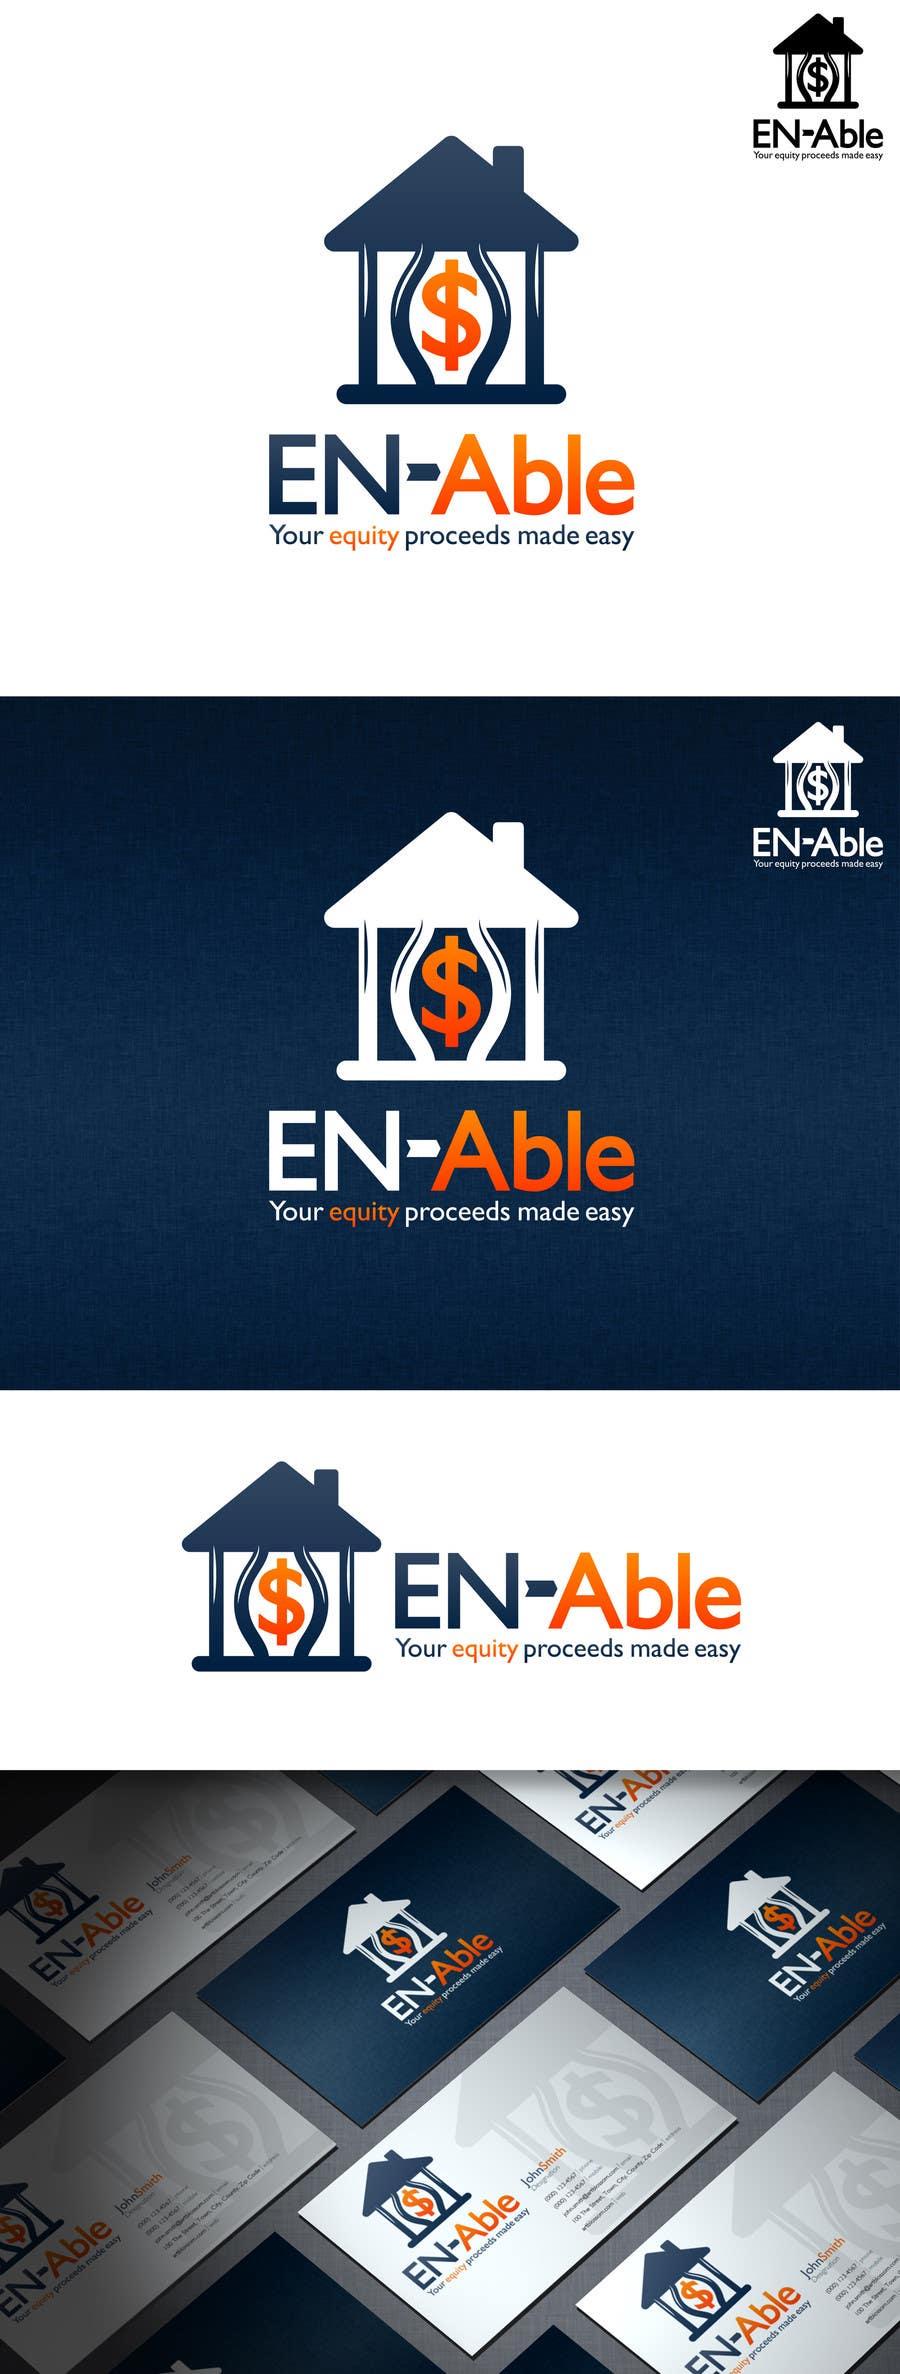 Penyertaan Peraduan #                                        64                                      untuk                                         Design a Logo for EN-Able Equity Funding Solutions (Pty) Ltd